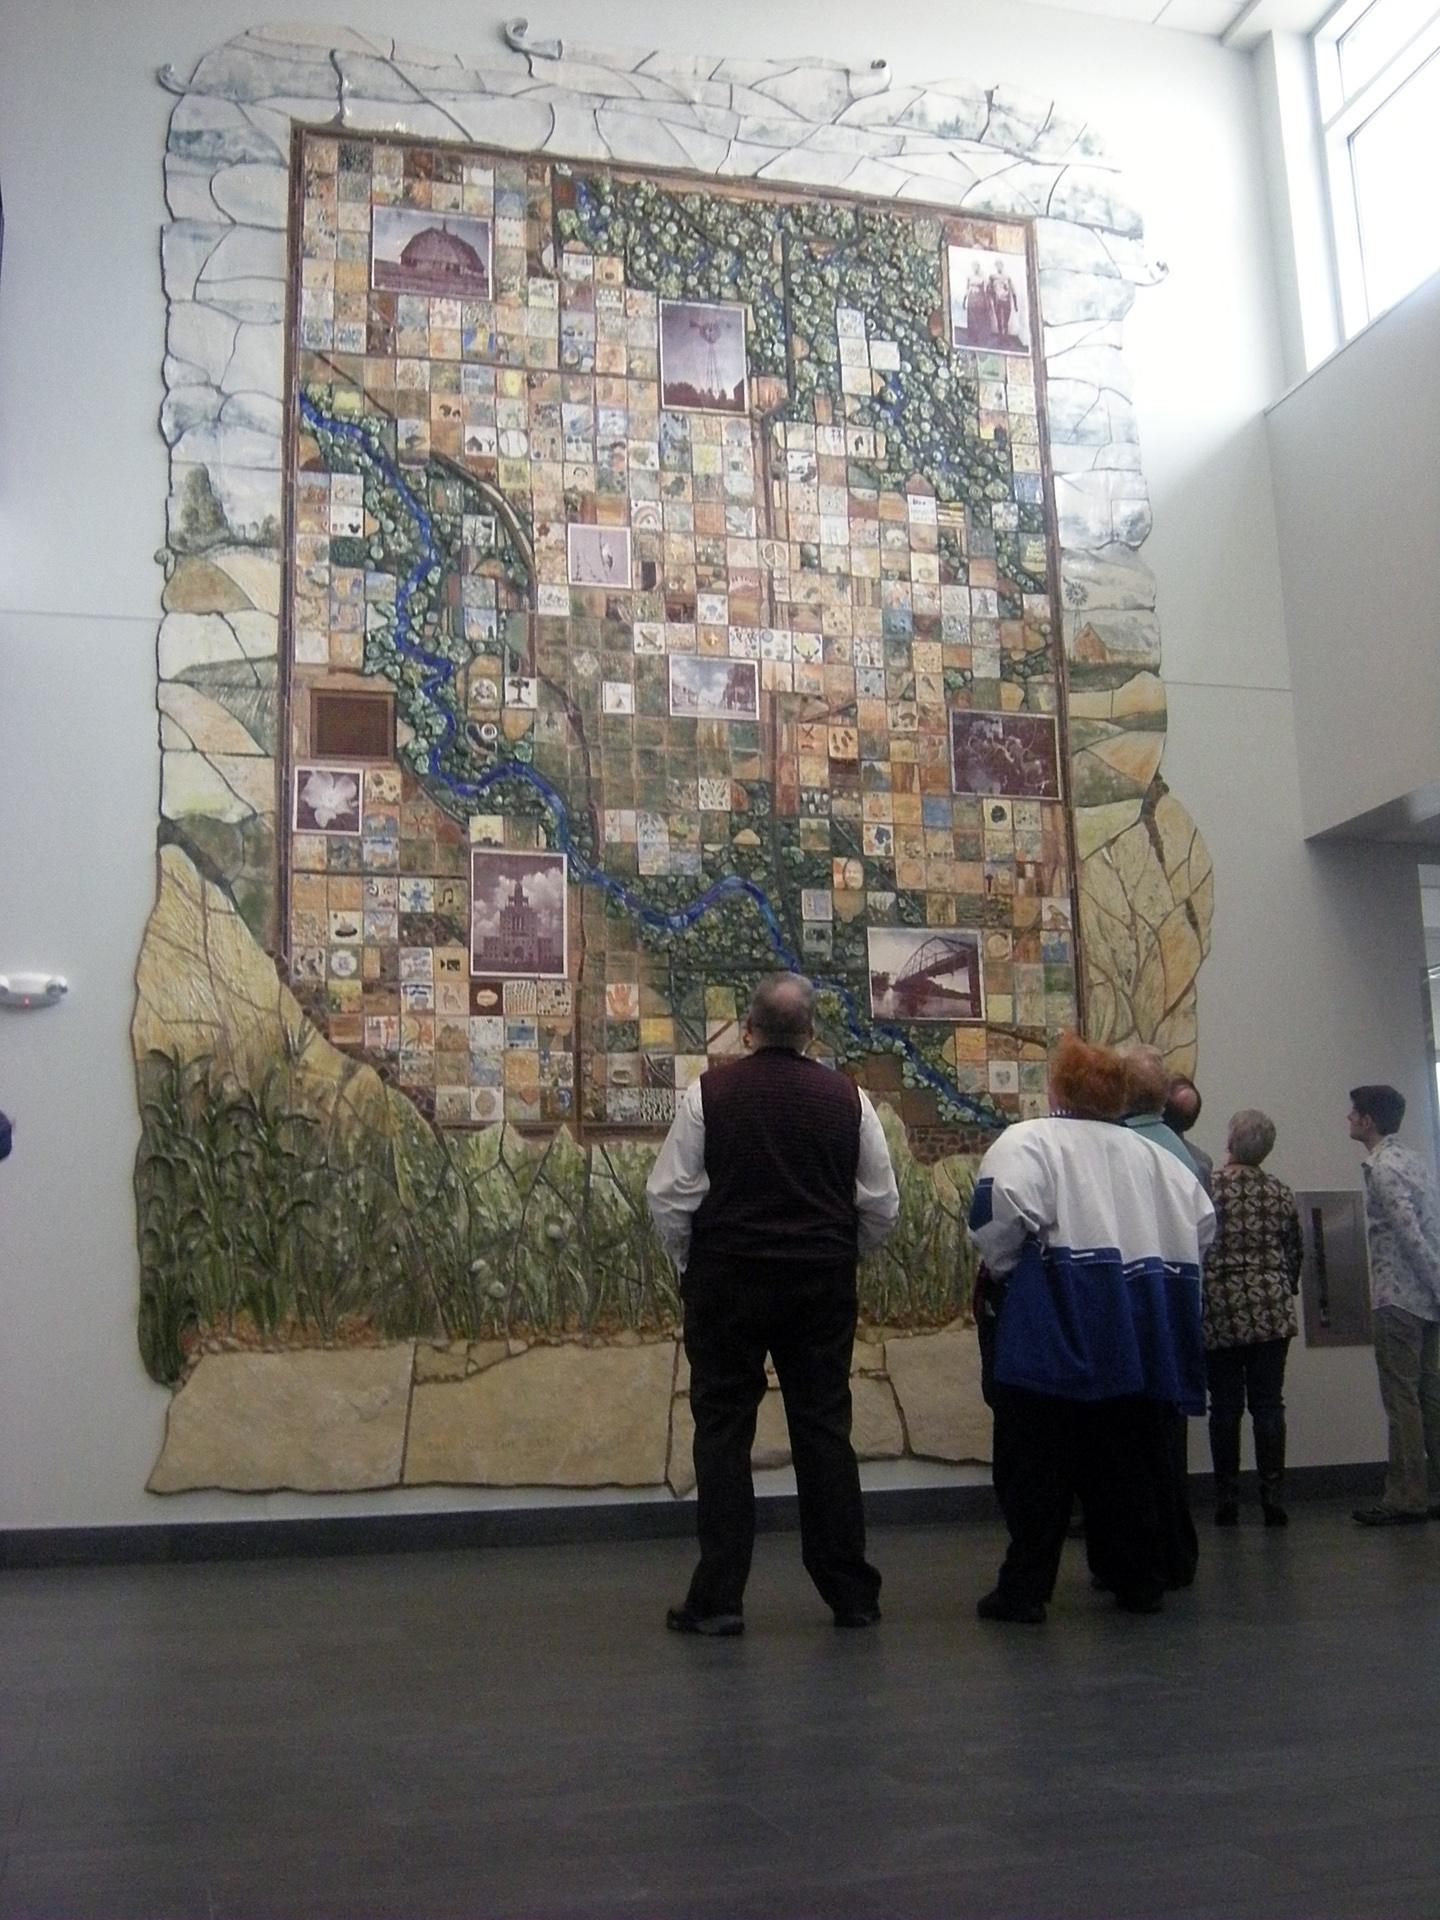 The Sense of Place – ceramic mural at Linn County Community Services Building, Cedar Rapids, IA, USA